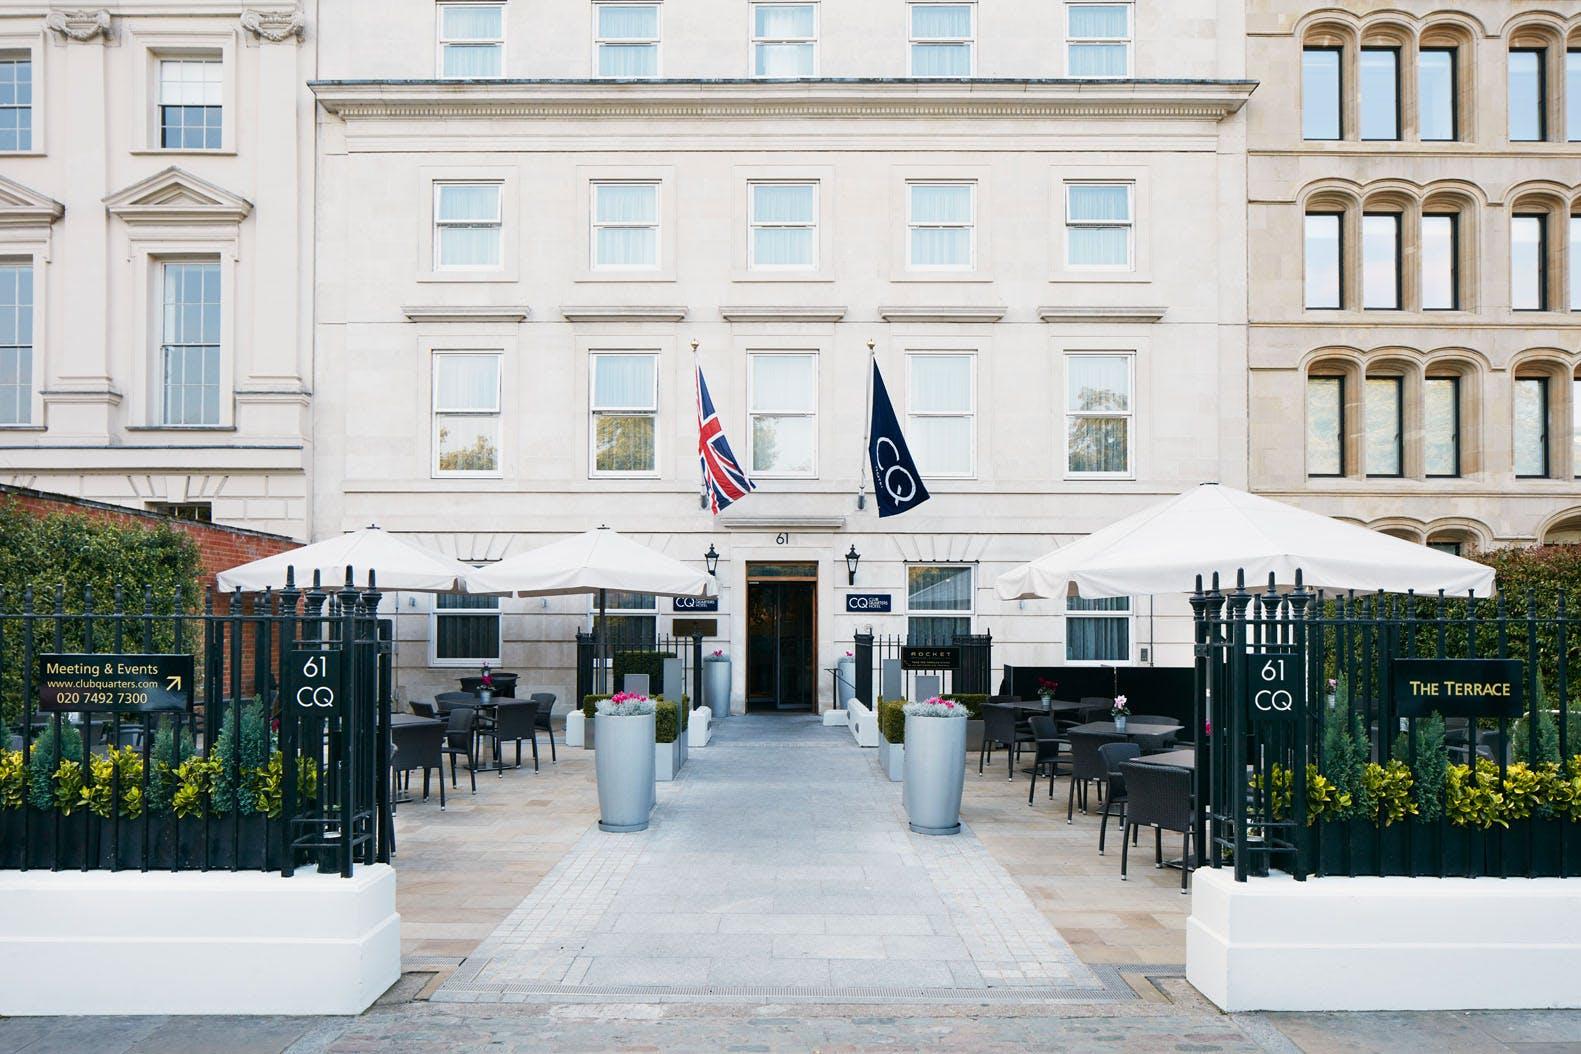 Exterior, Club Quarters Hotel, Lincoln's Inn Fields - Holborn, London